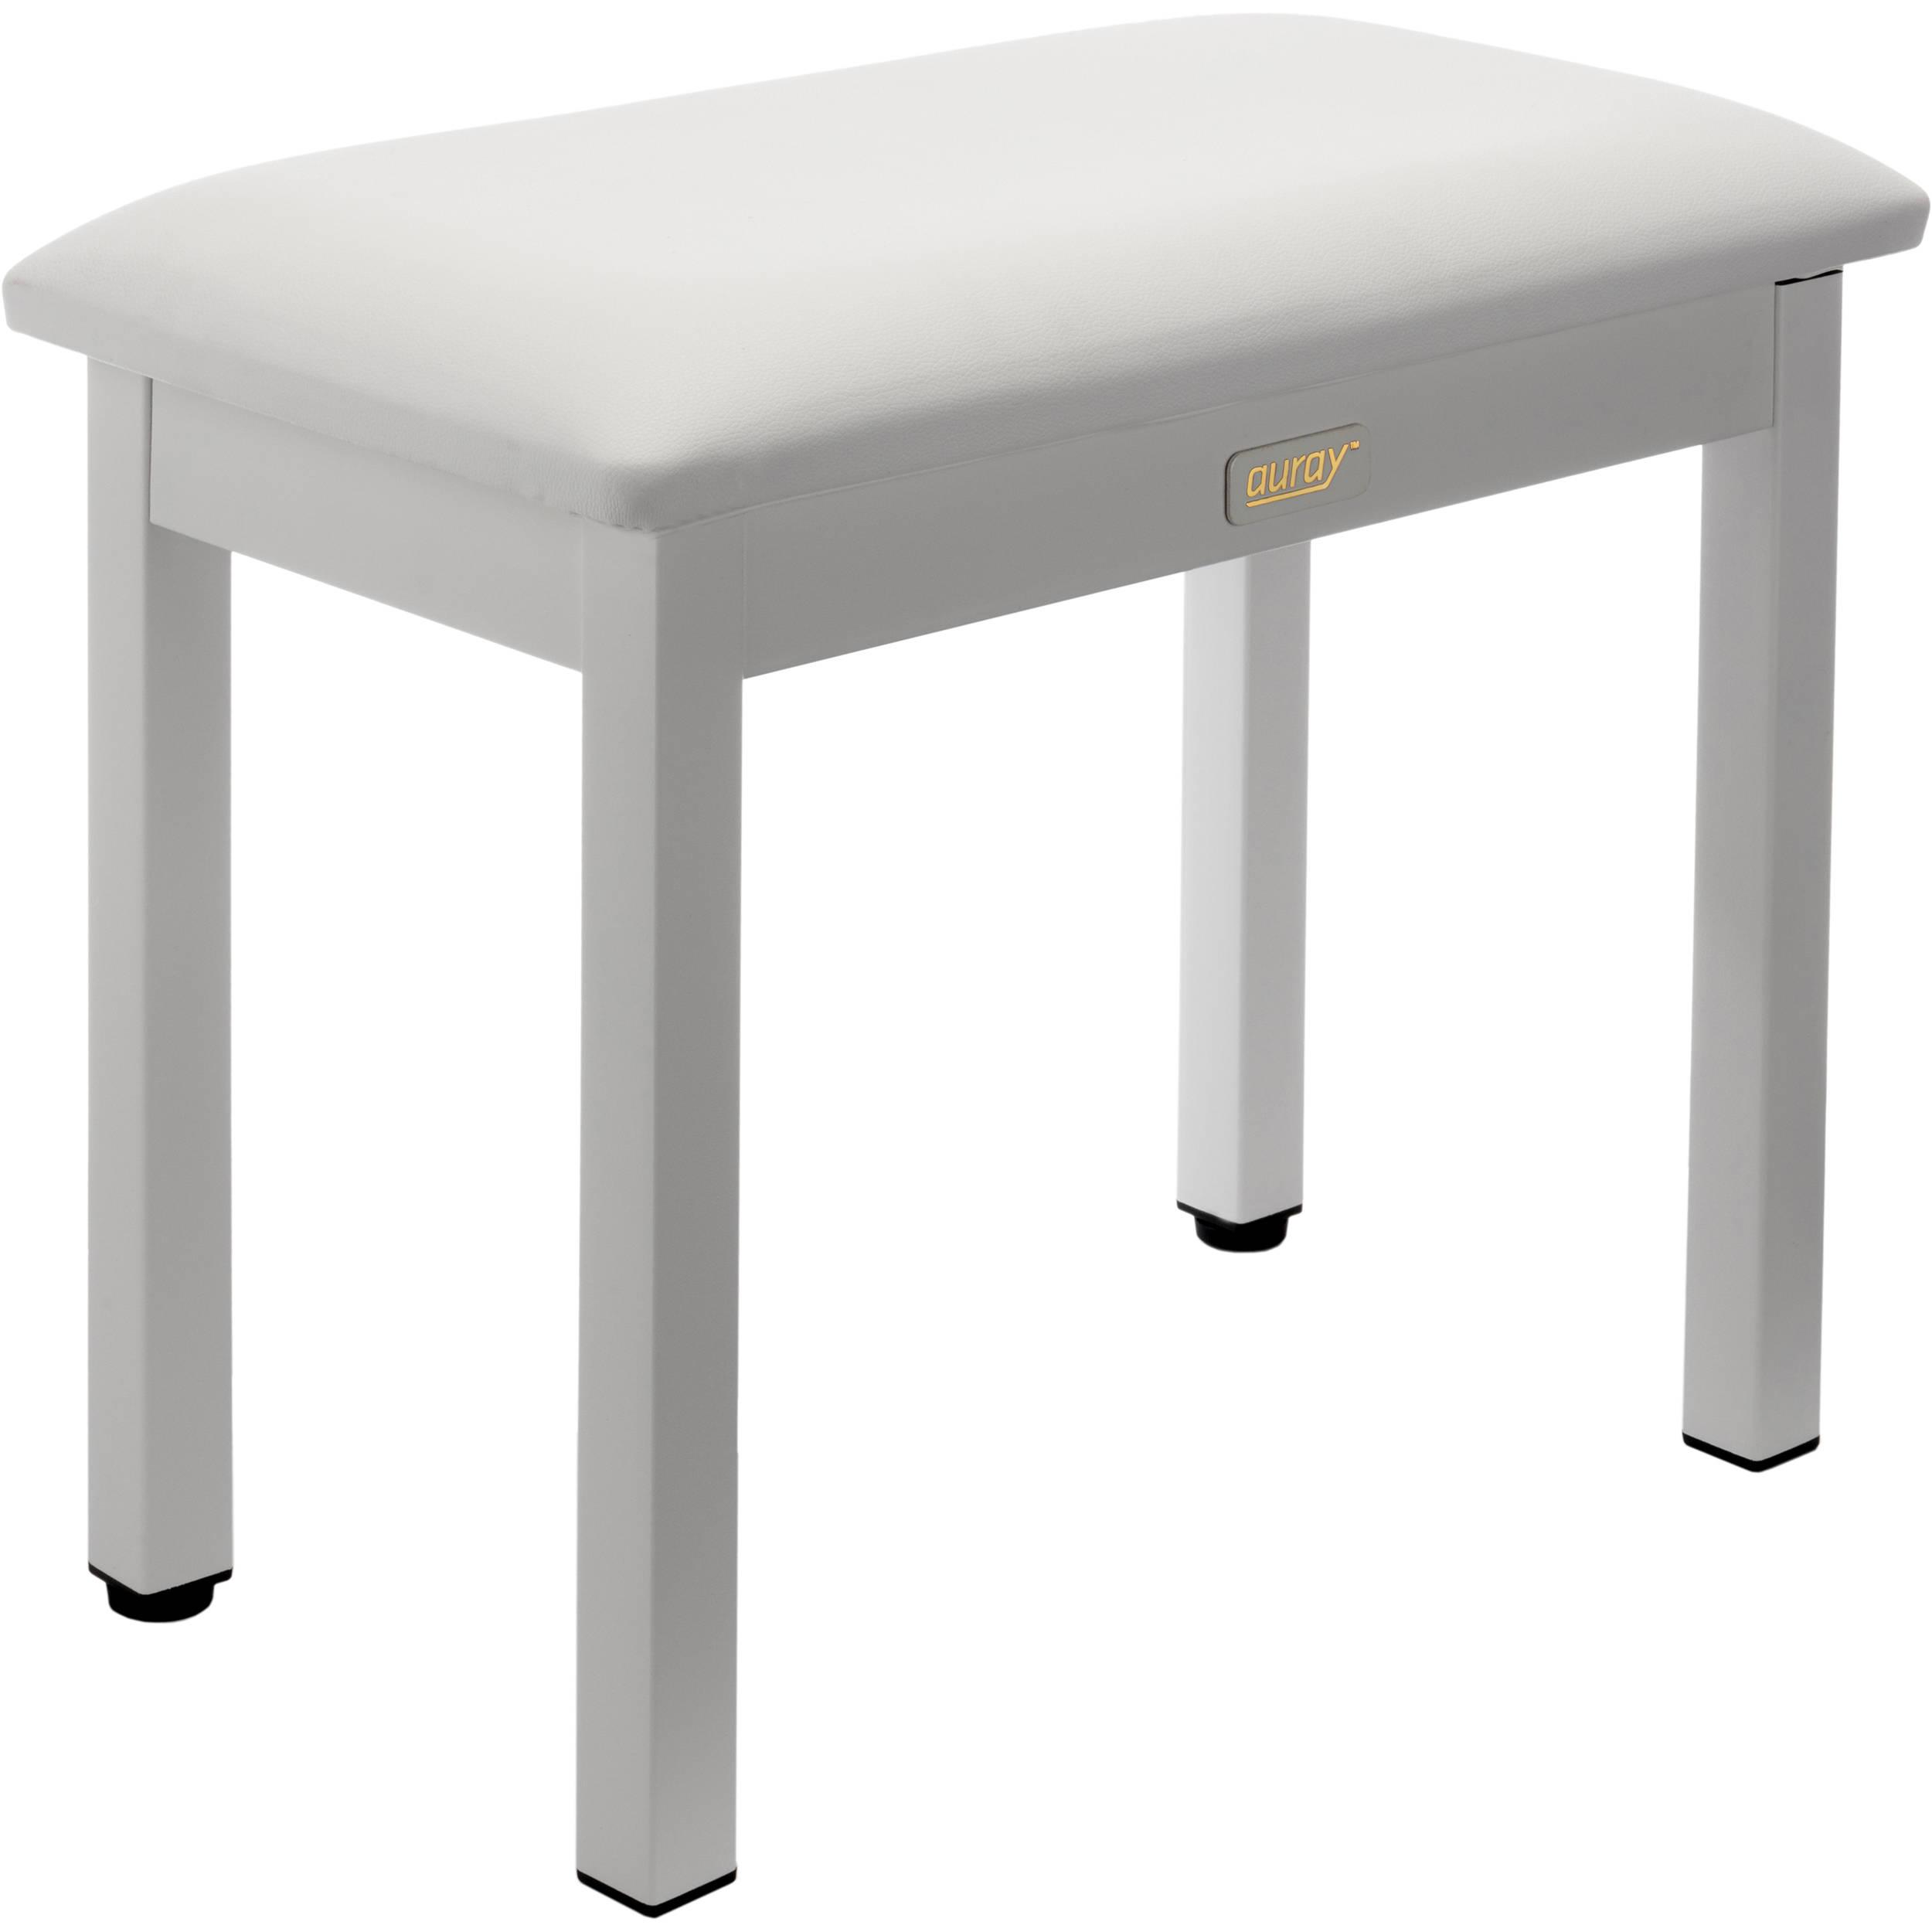 Sensational Auray Pbm Fw Metal Frame Piano Bench White Pabps2019 Chair Design Images Pabps2019Com